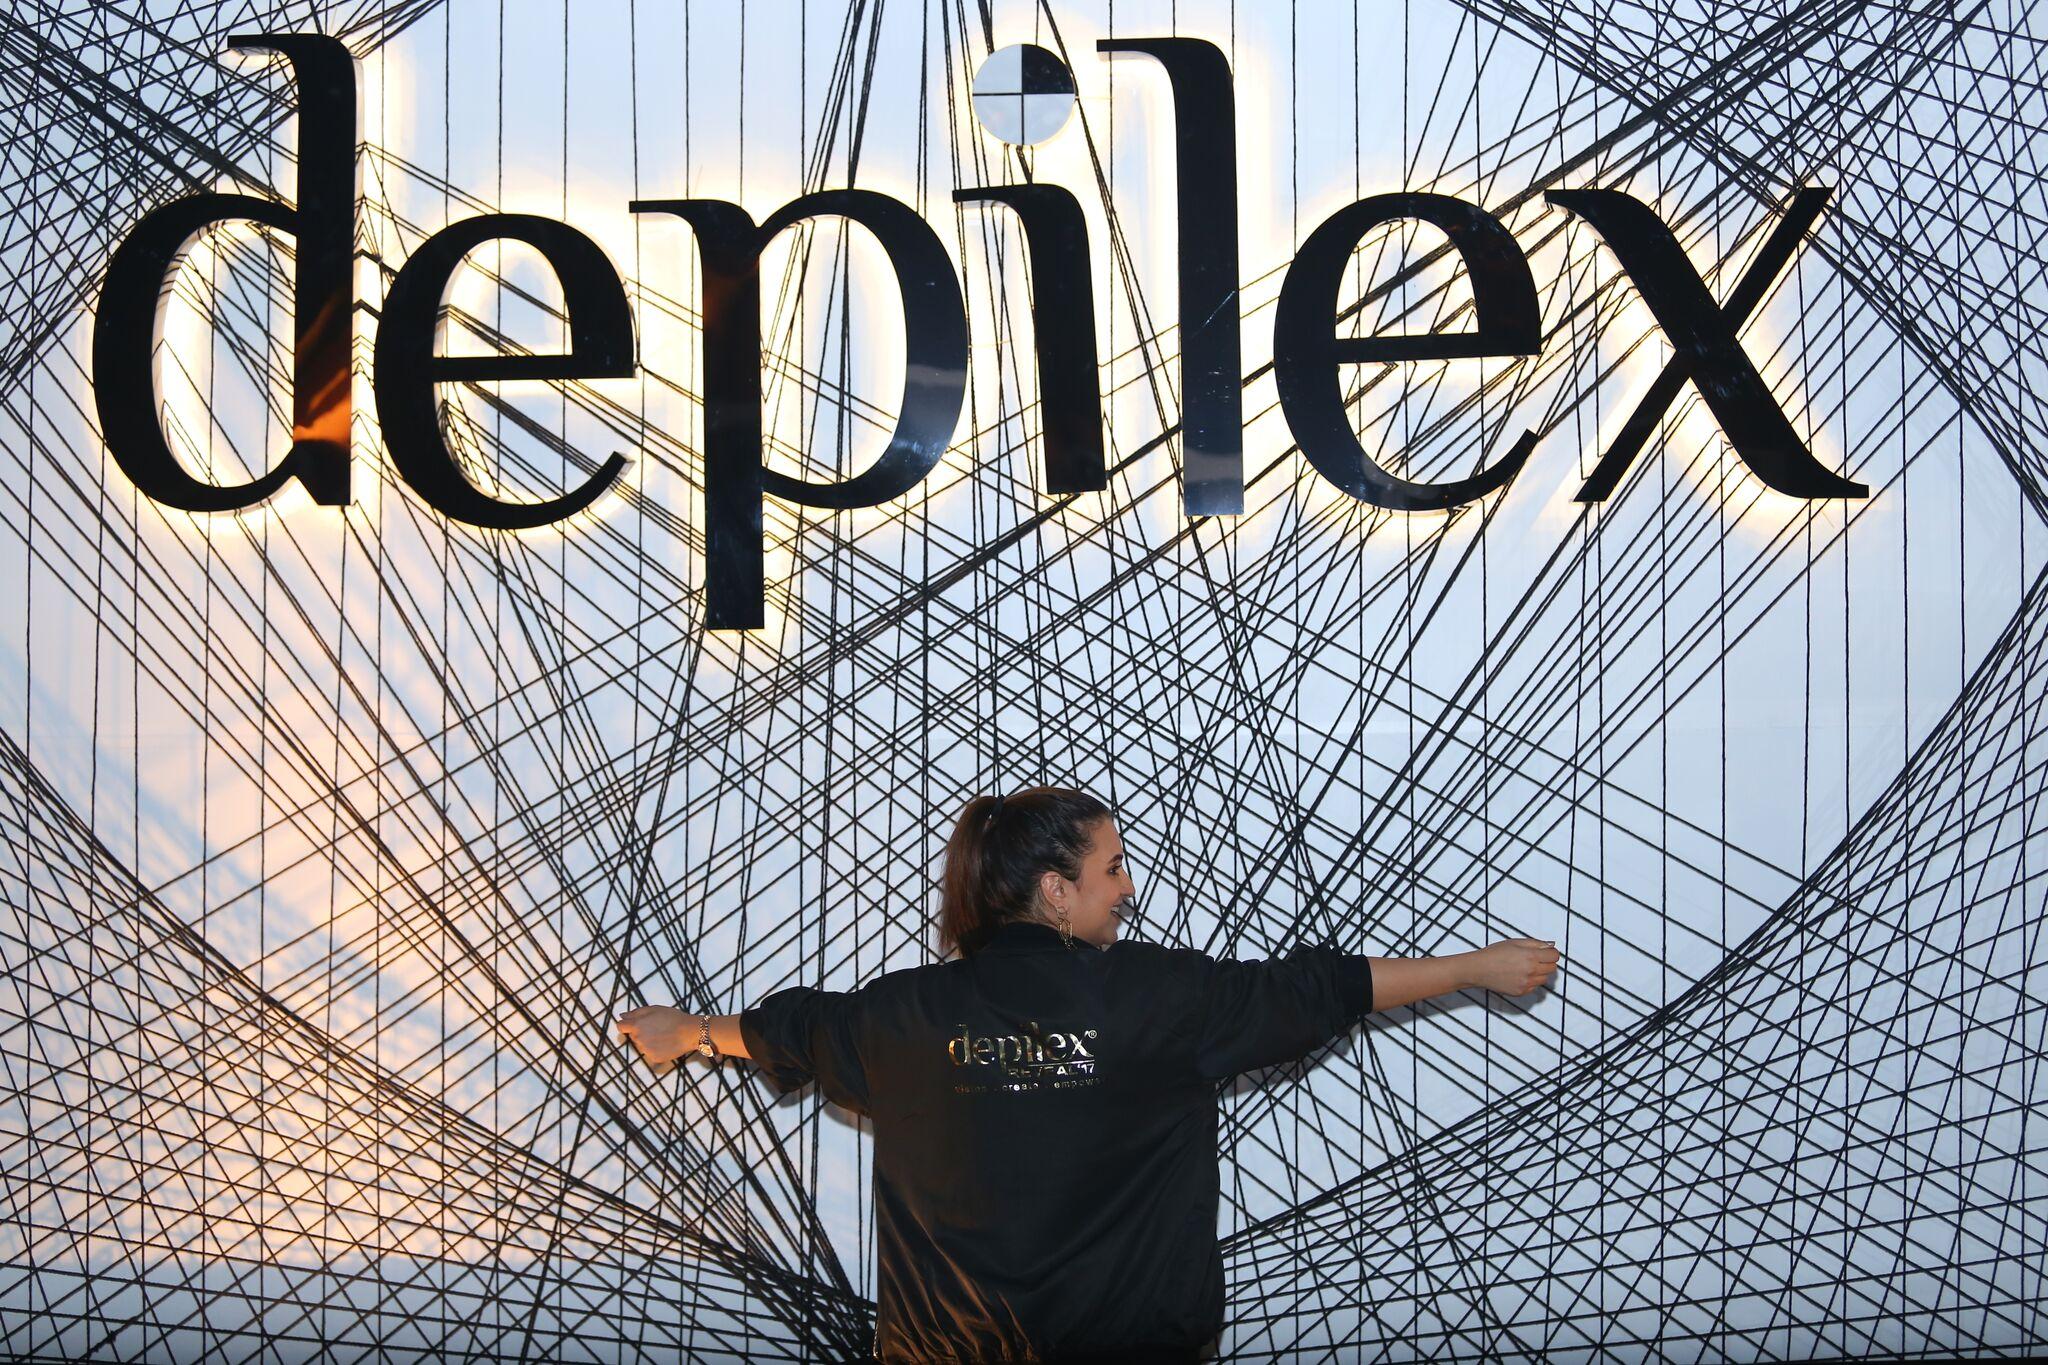 Redah Misbah at the lack Carpet of Depilex Reveal '17